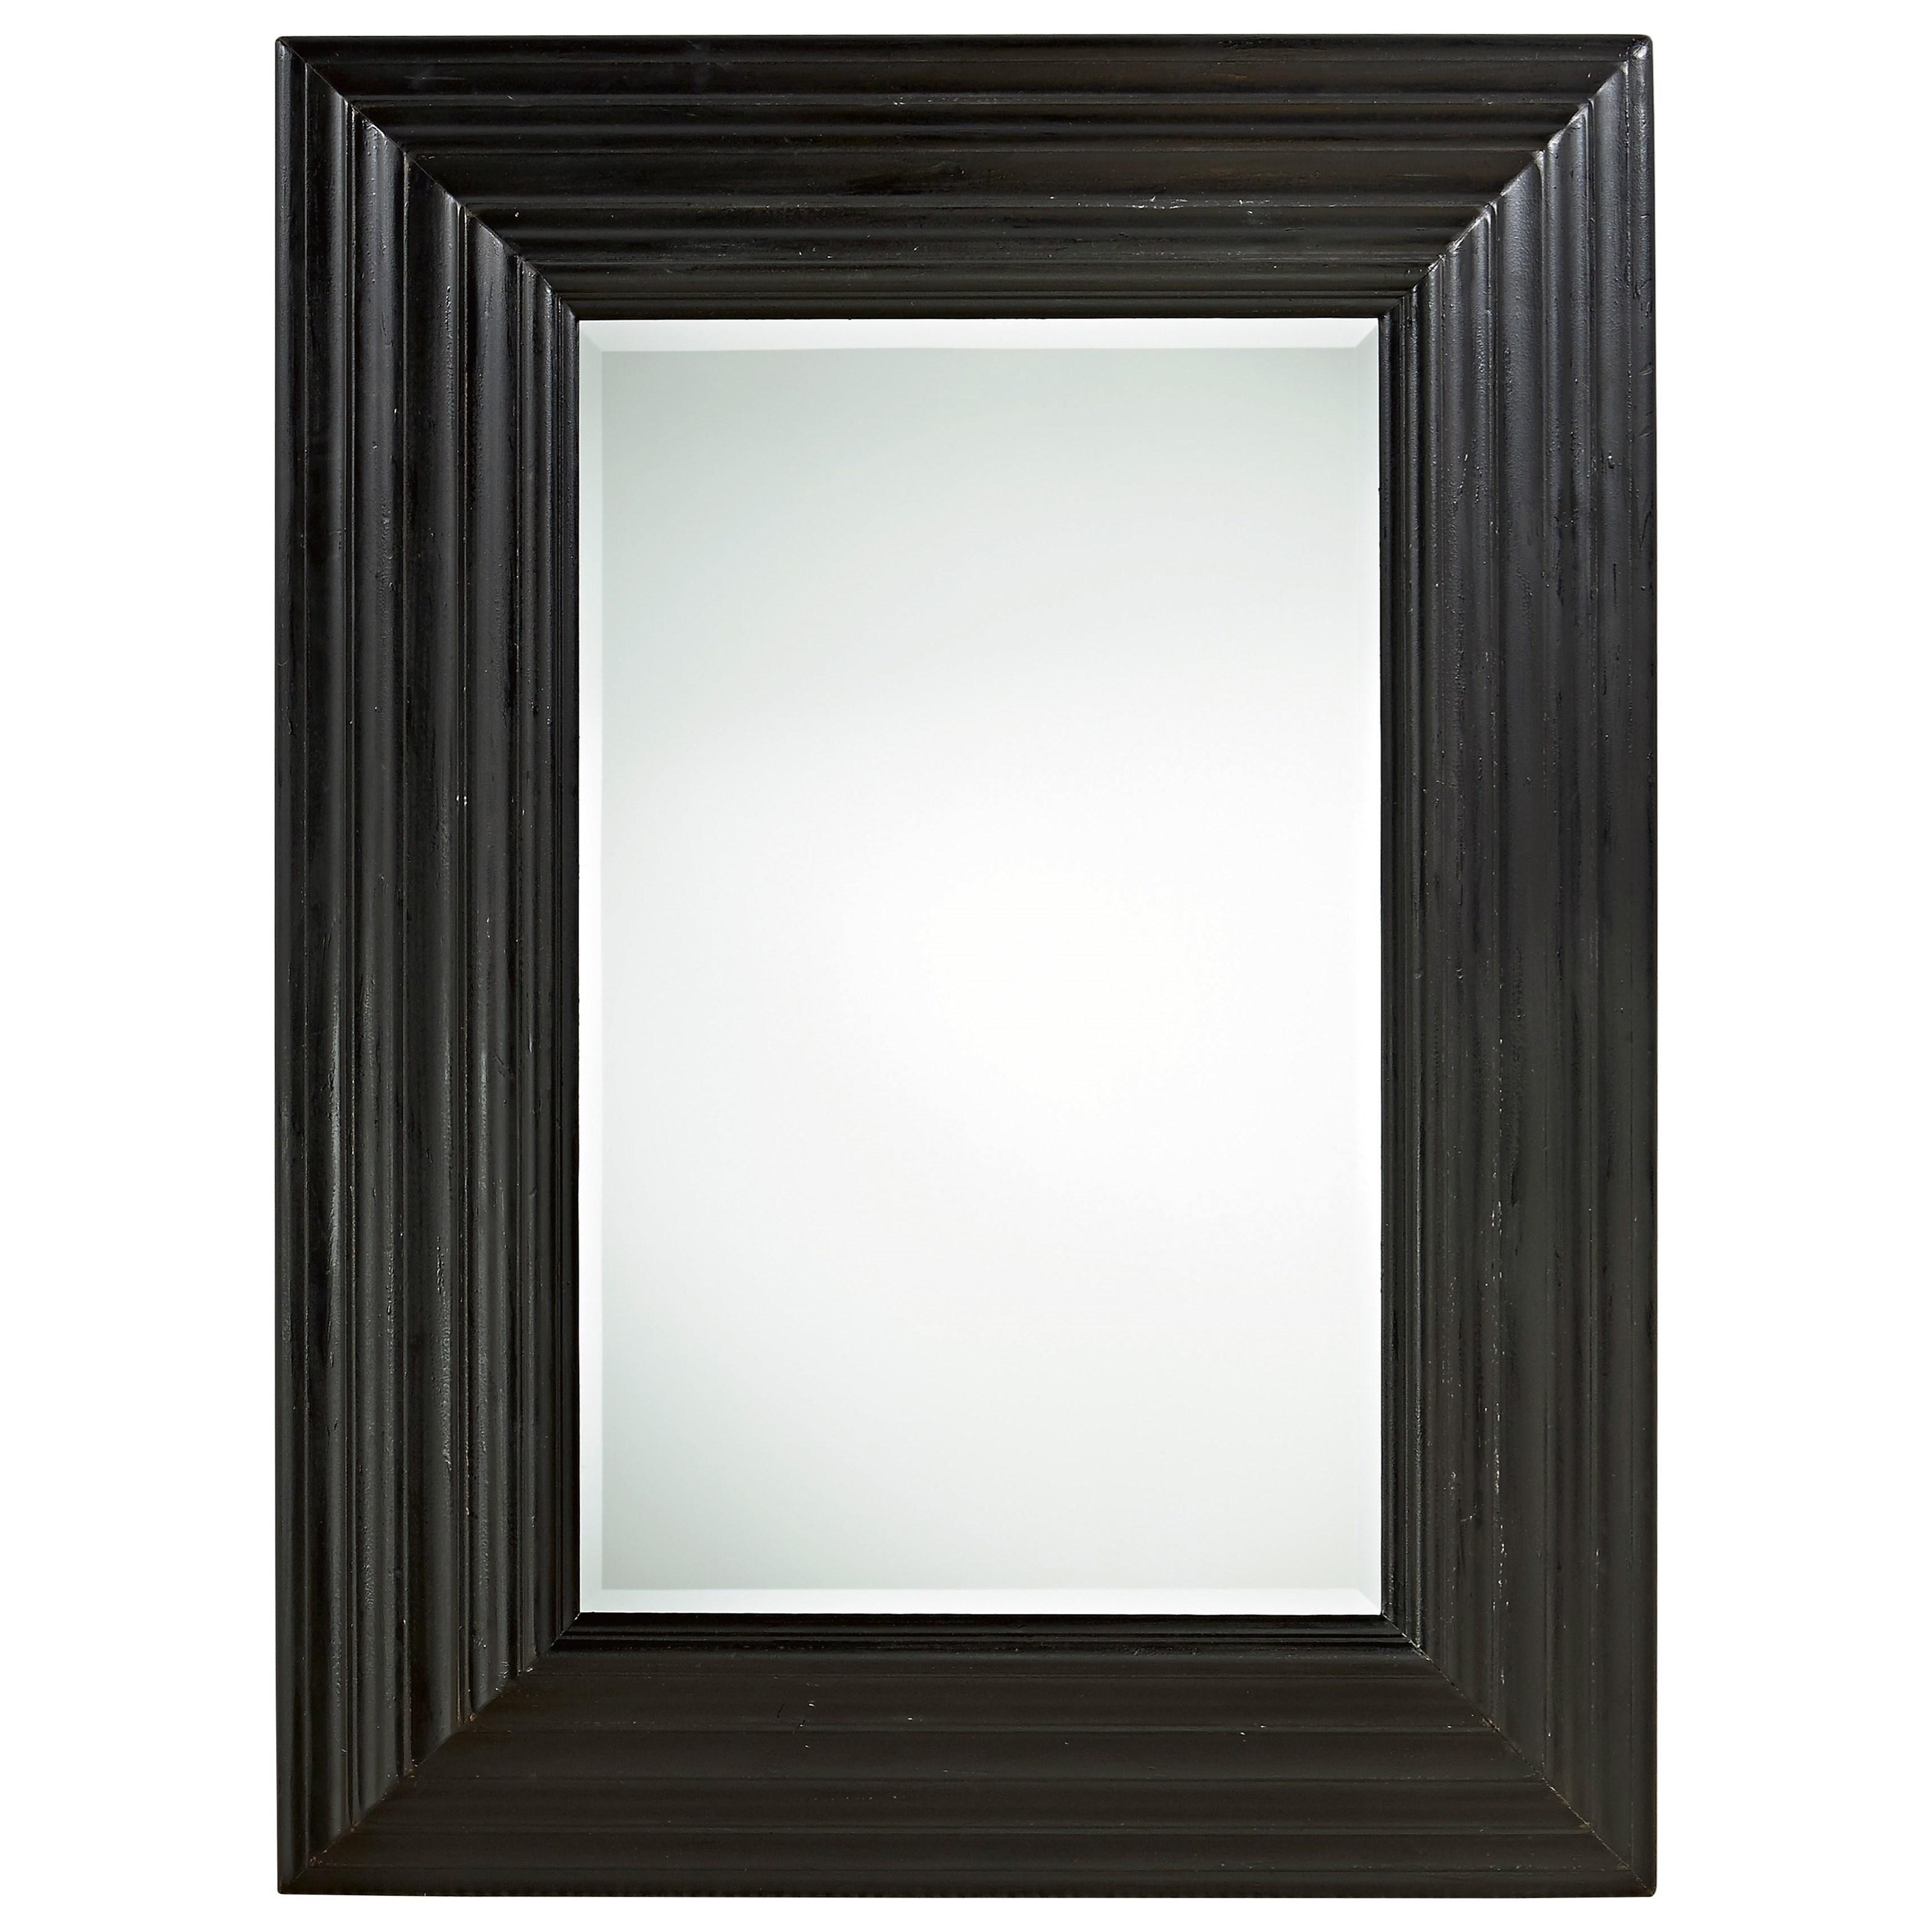 Universal Authenticity Portrait Mirror - Item Number: 572A04M